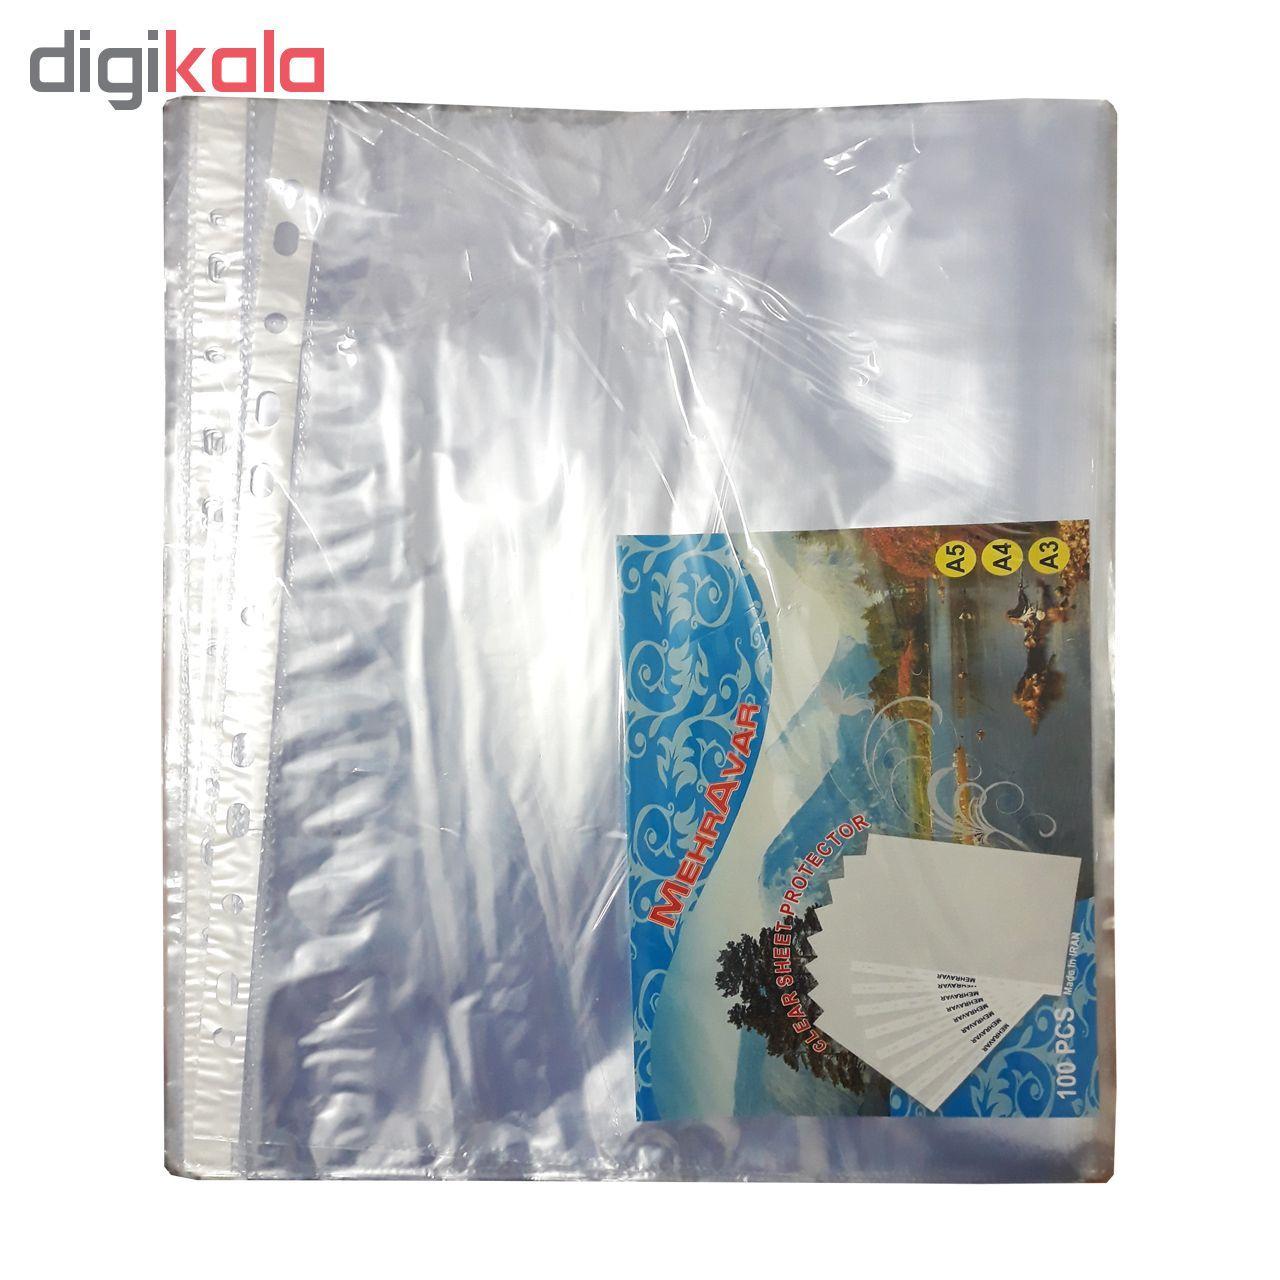 کاور کاغذ مهرآور سایز A4  بسته 100 عددی  main 1 1